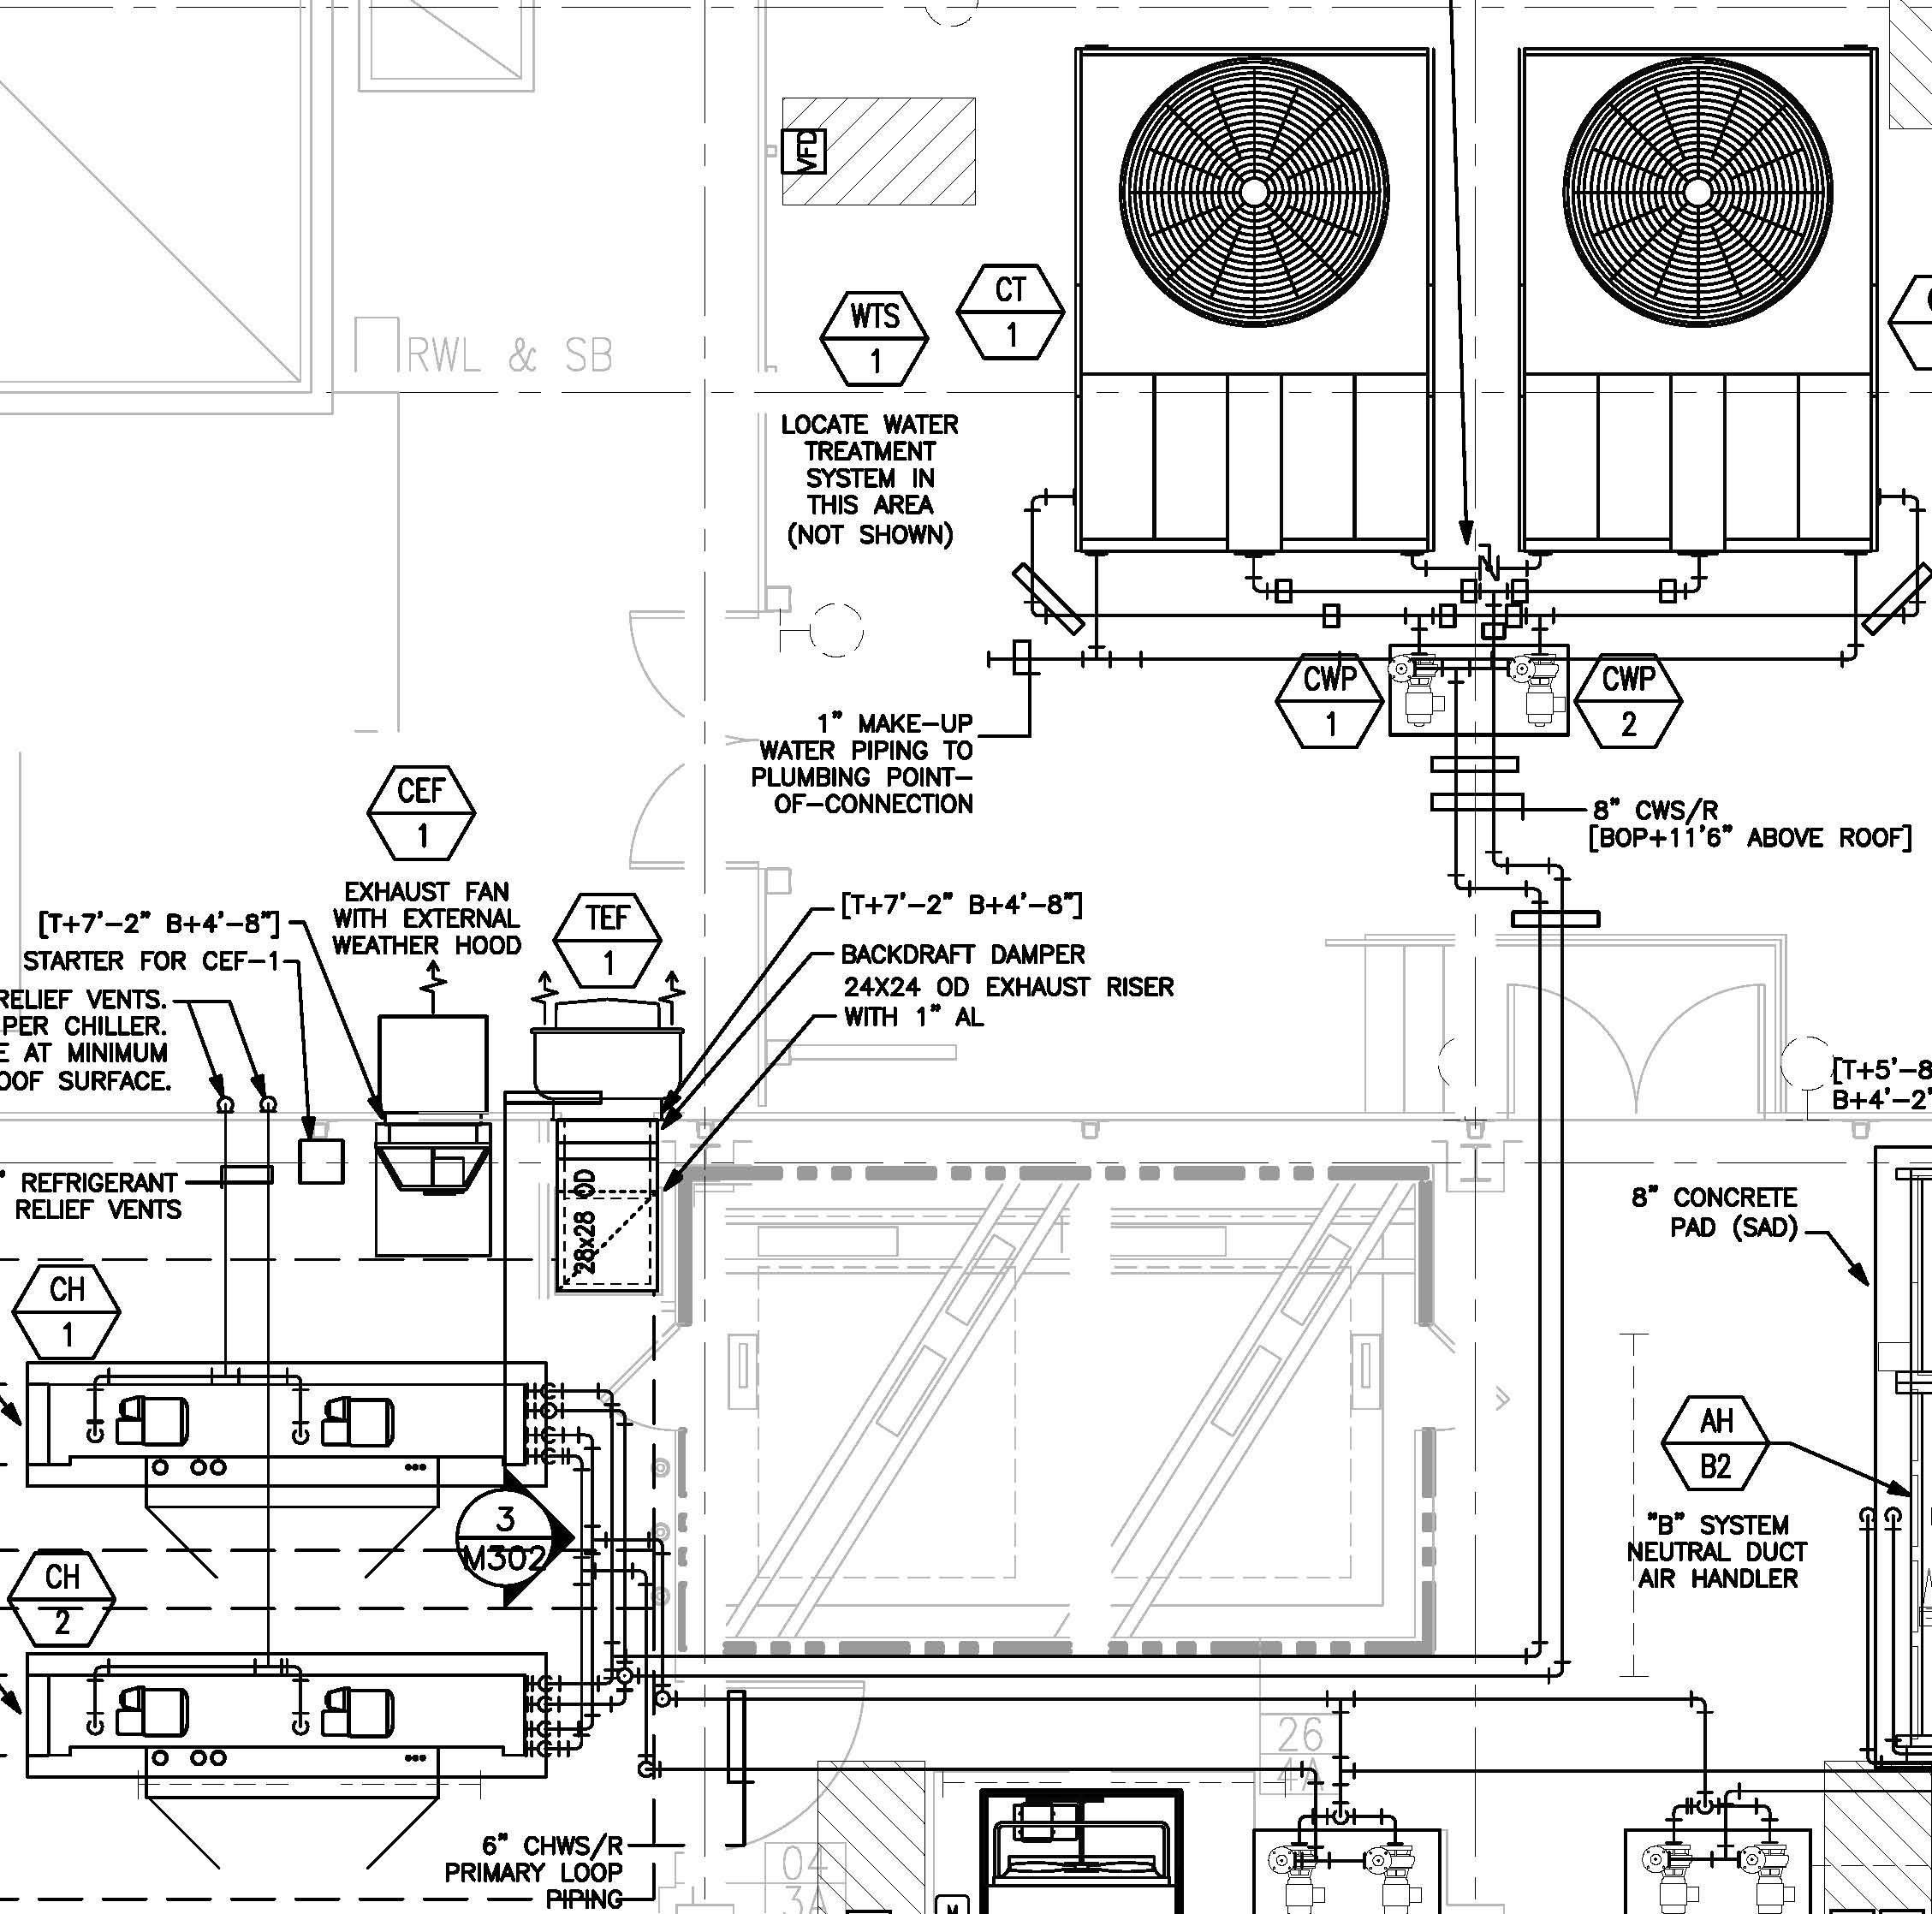 car lighting system wiring diagram 04 volvo xc90 auto ac parts my